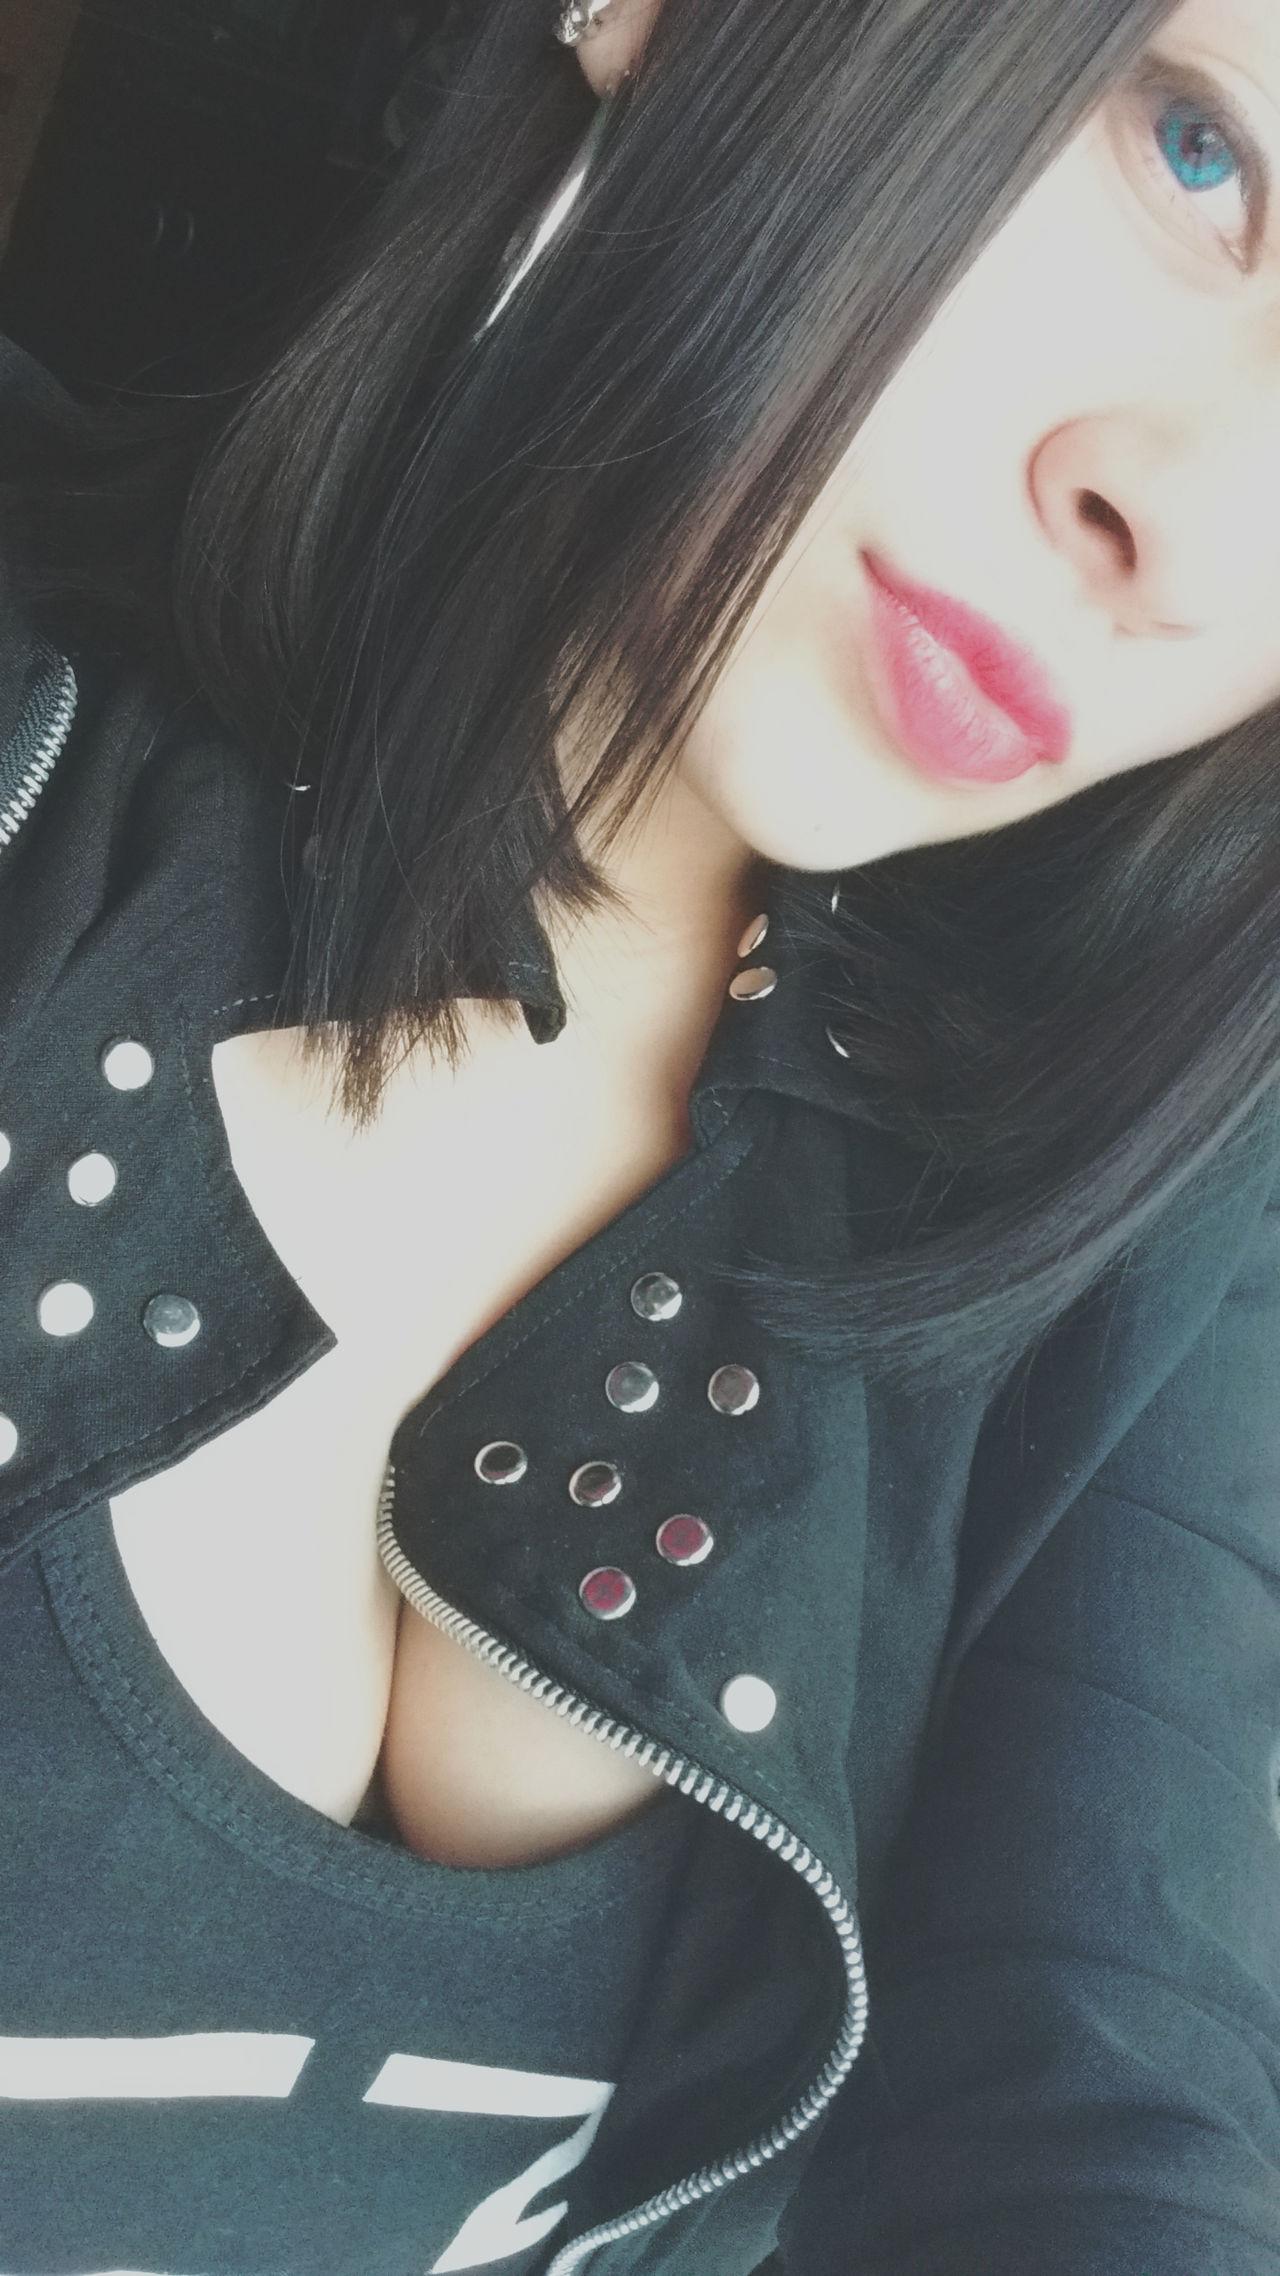 Black Shirt Blackshirt Eyes First Eyeem Photo Beautiful ♥ EyeEm Germany Blackhair Hello World ✌ Rockgirl Popular Photos Short Hair Girl Hello World Blue Eyes Beautiful Girl Fan Rammstein Rammstein Rammstein Girl